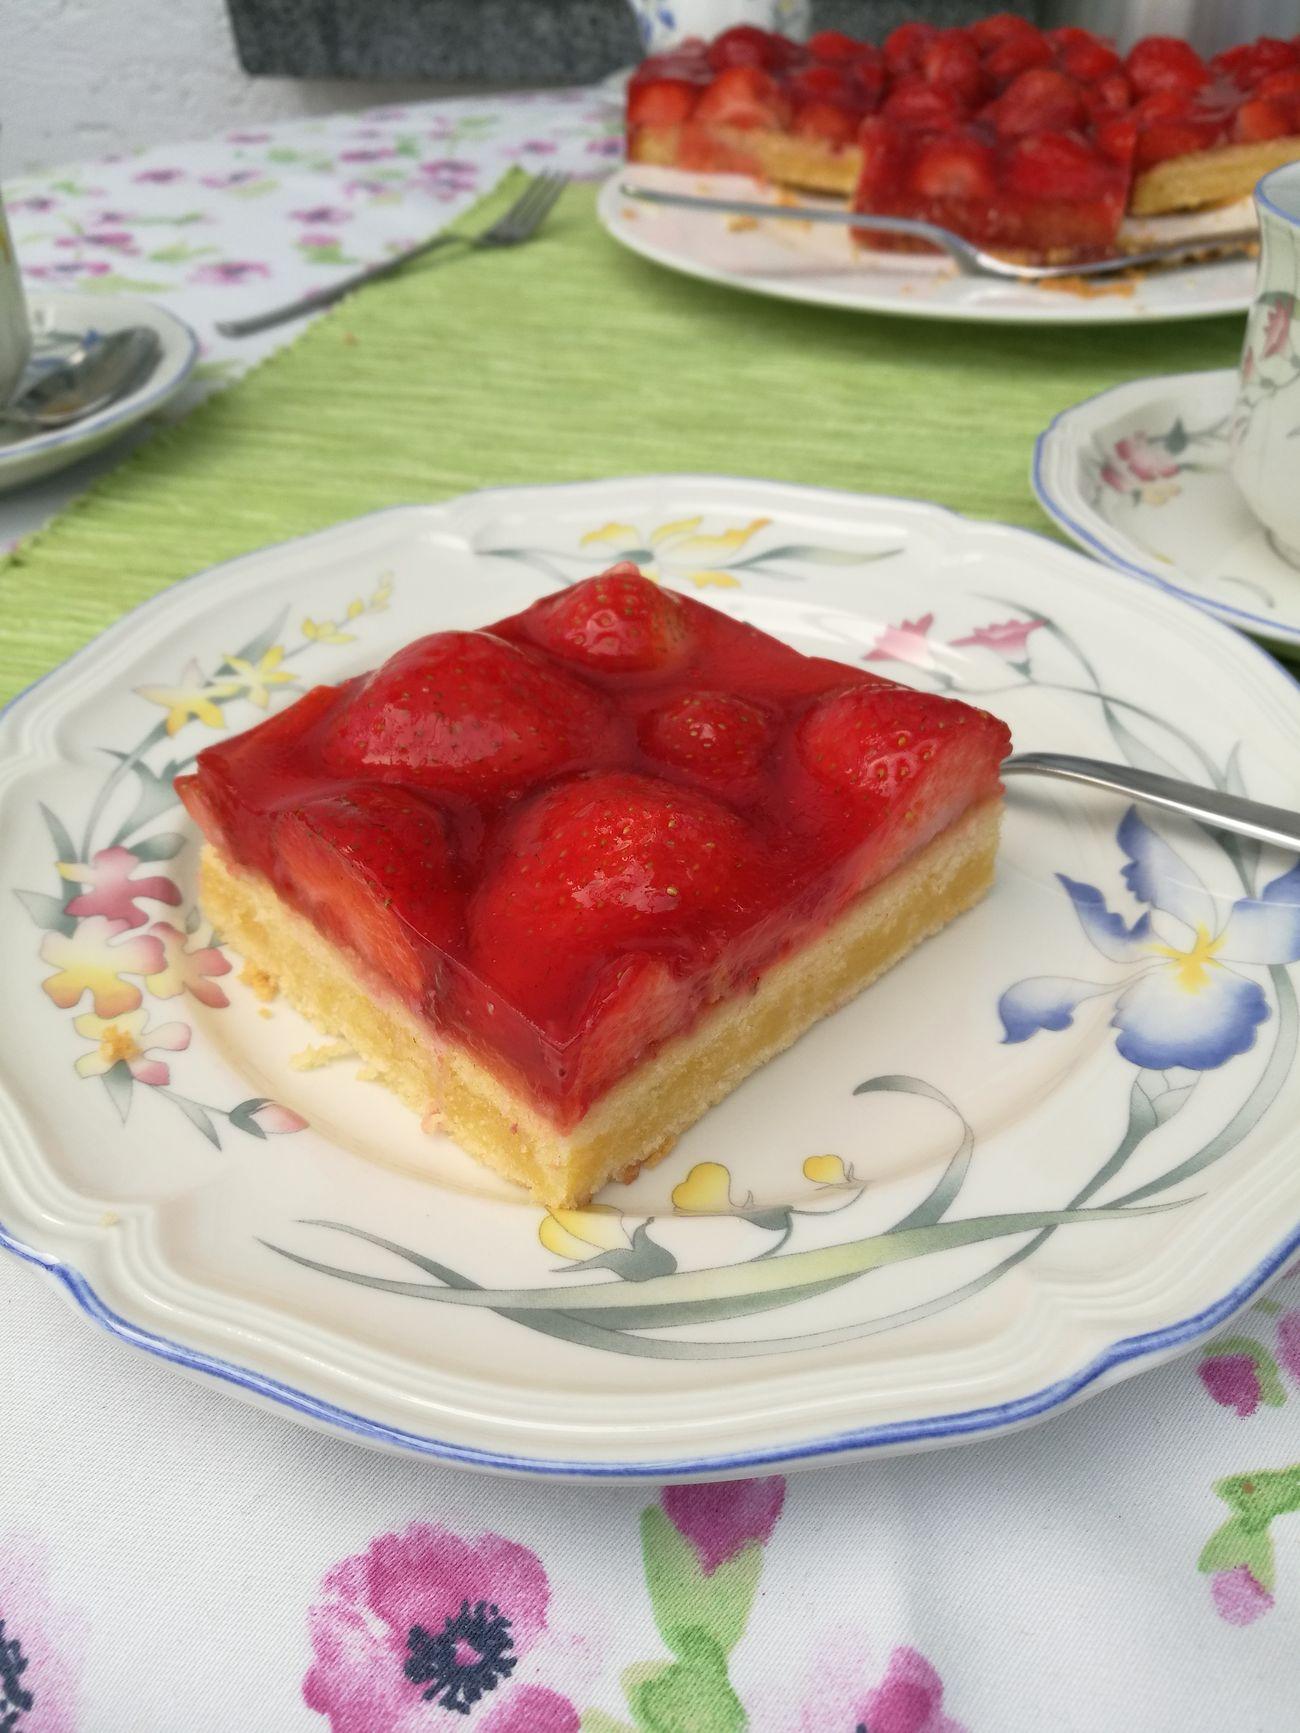 Sweet Food Dessert Cake Raspberry Tart - Dessert No People Ready-to-eat Homemade